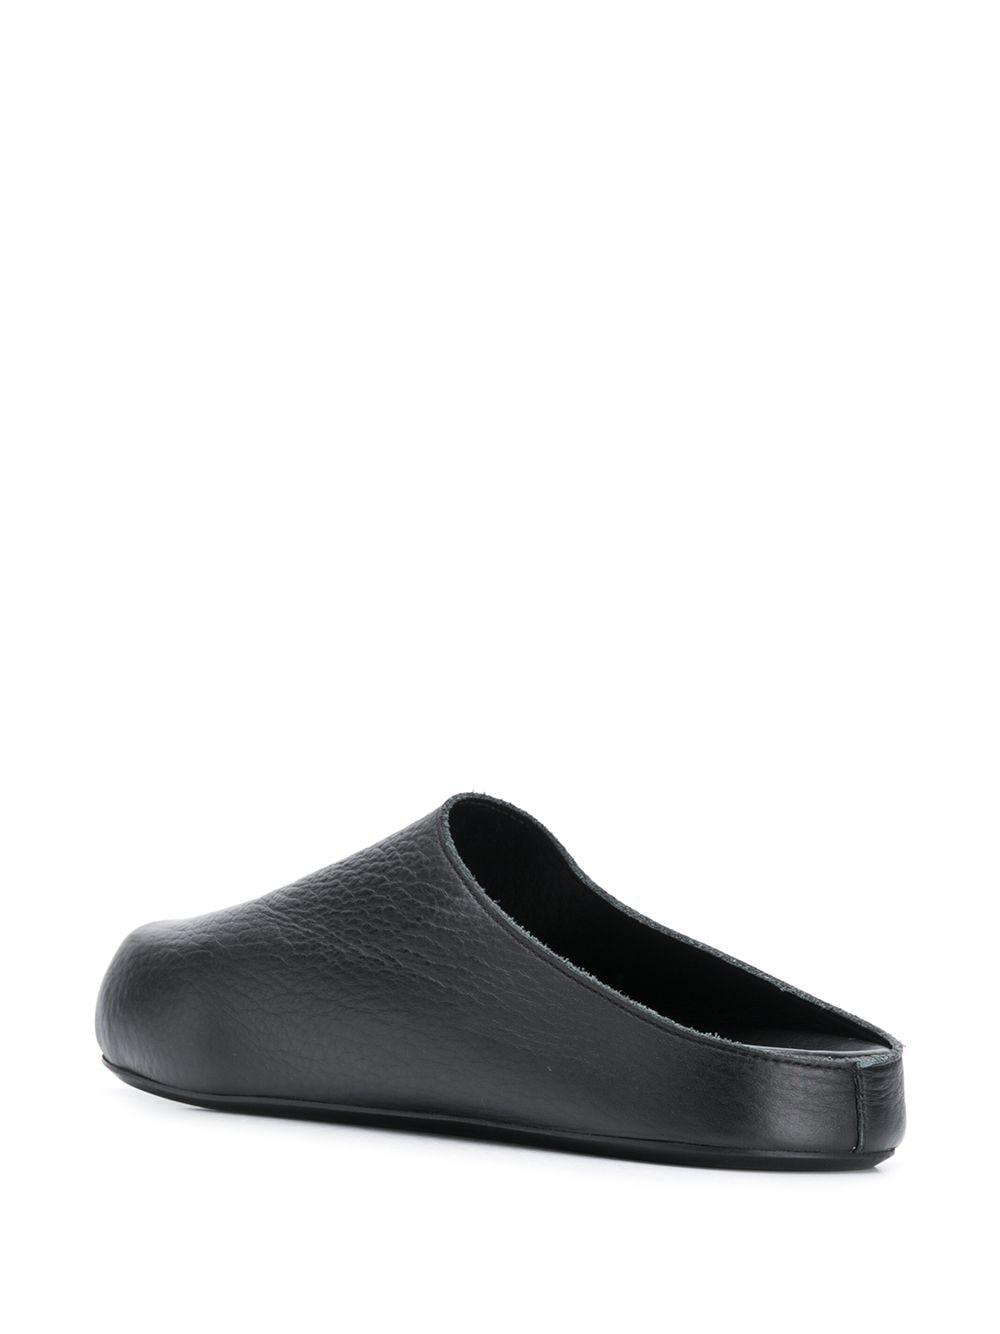 LEATHER SABOT MARNI | Sandals | SBMR000600 P393300N99